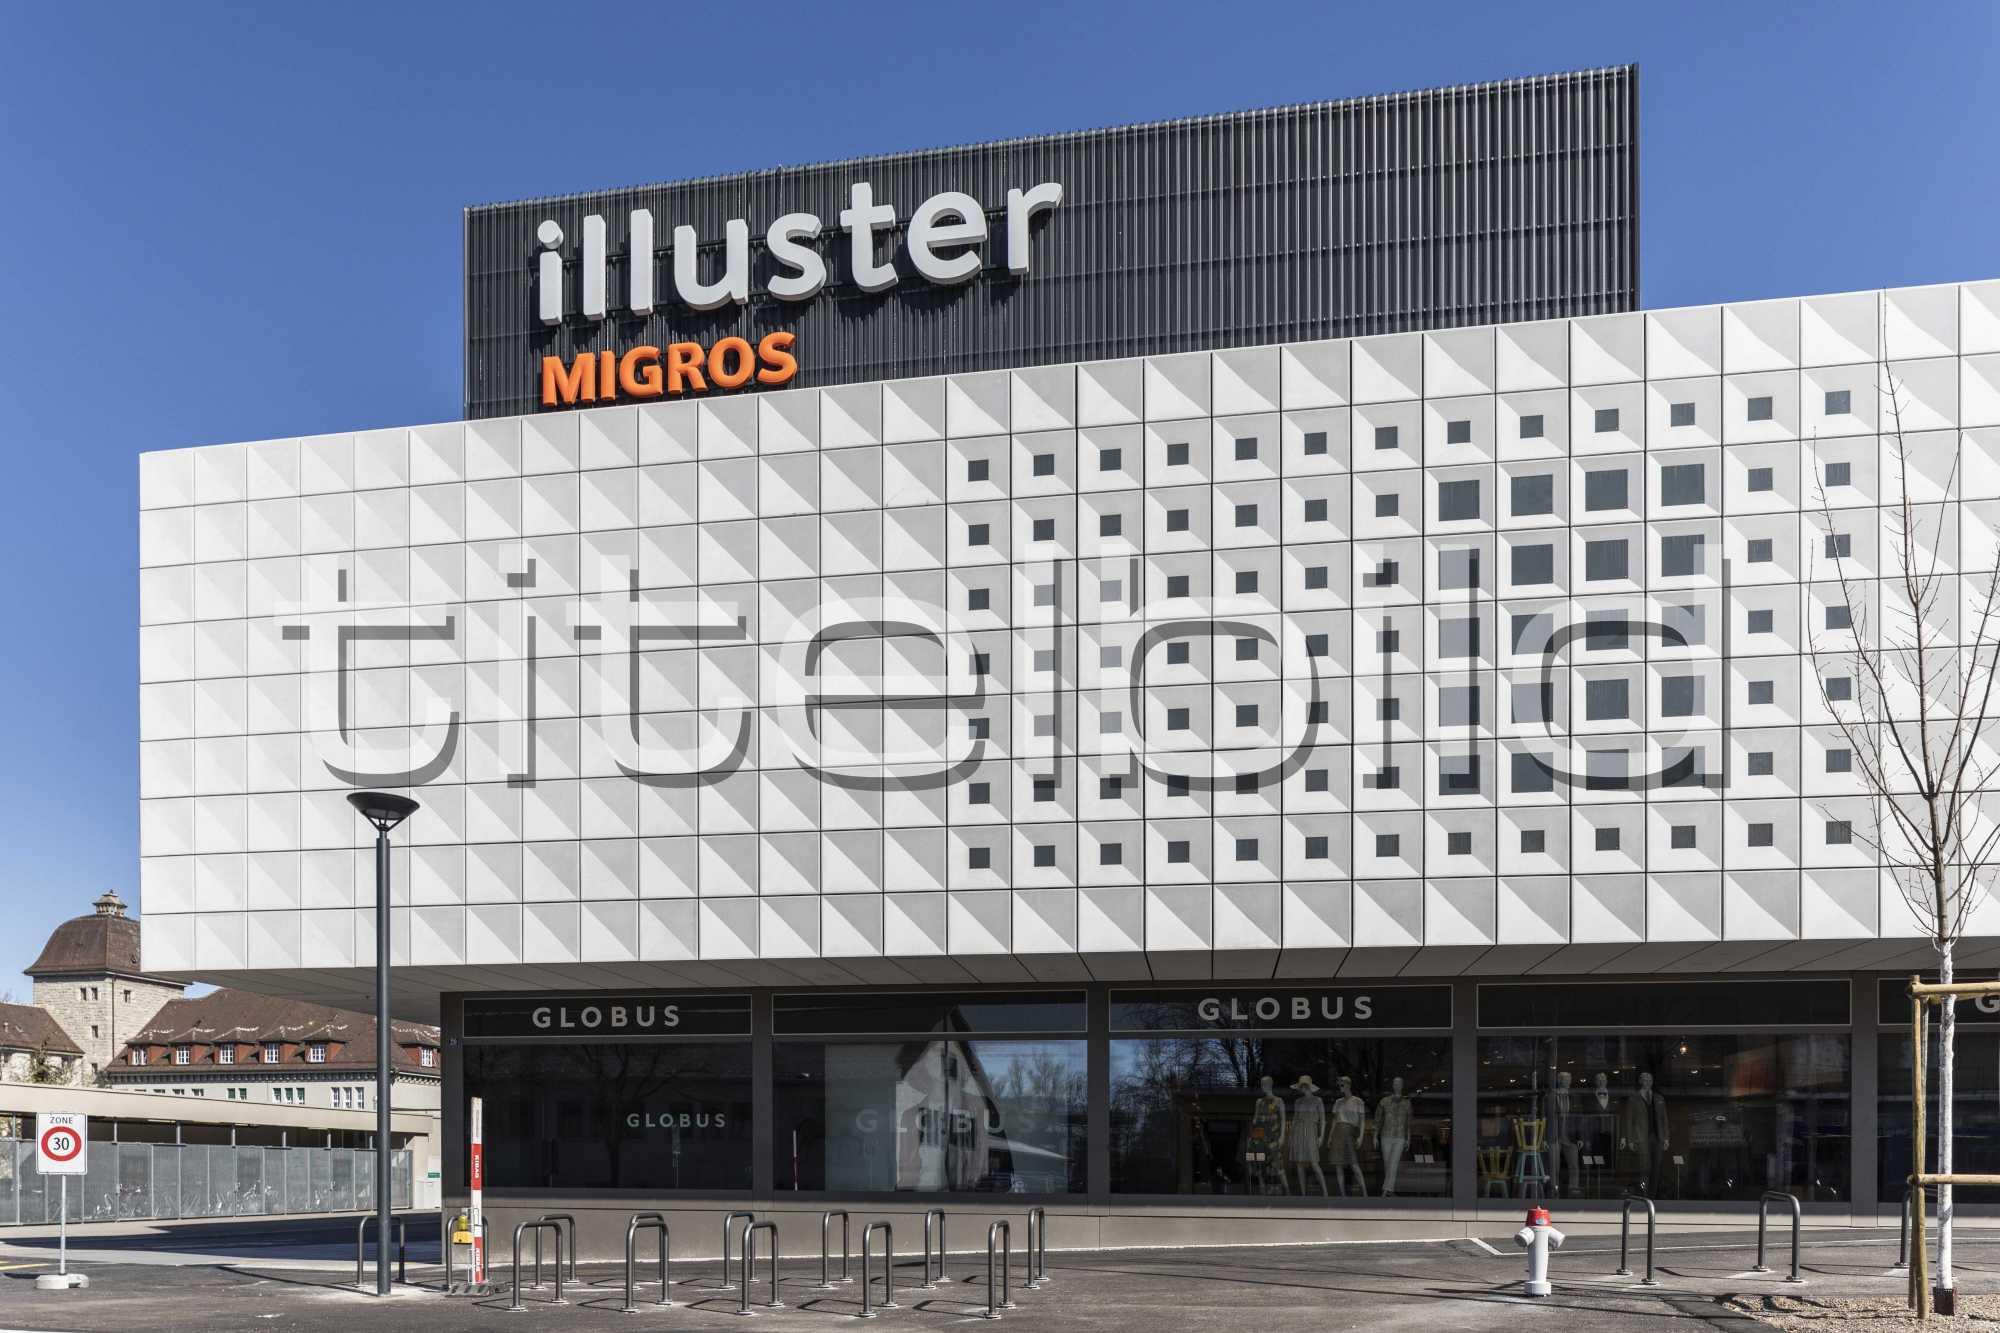 Projektbild-Nr. 2: Illuster Umbau Einkaufszentrum